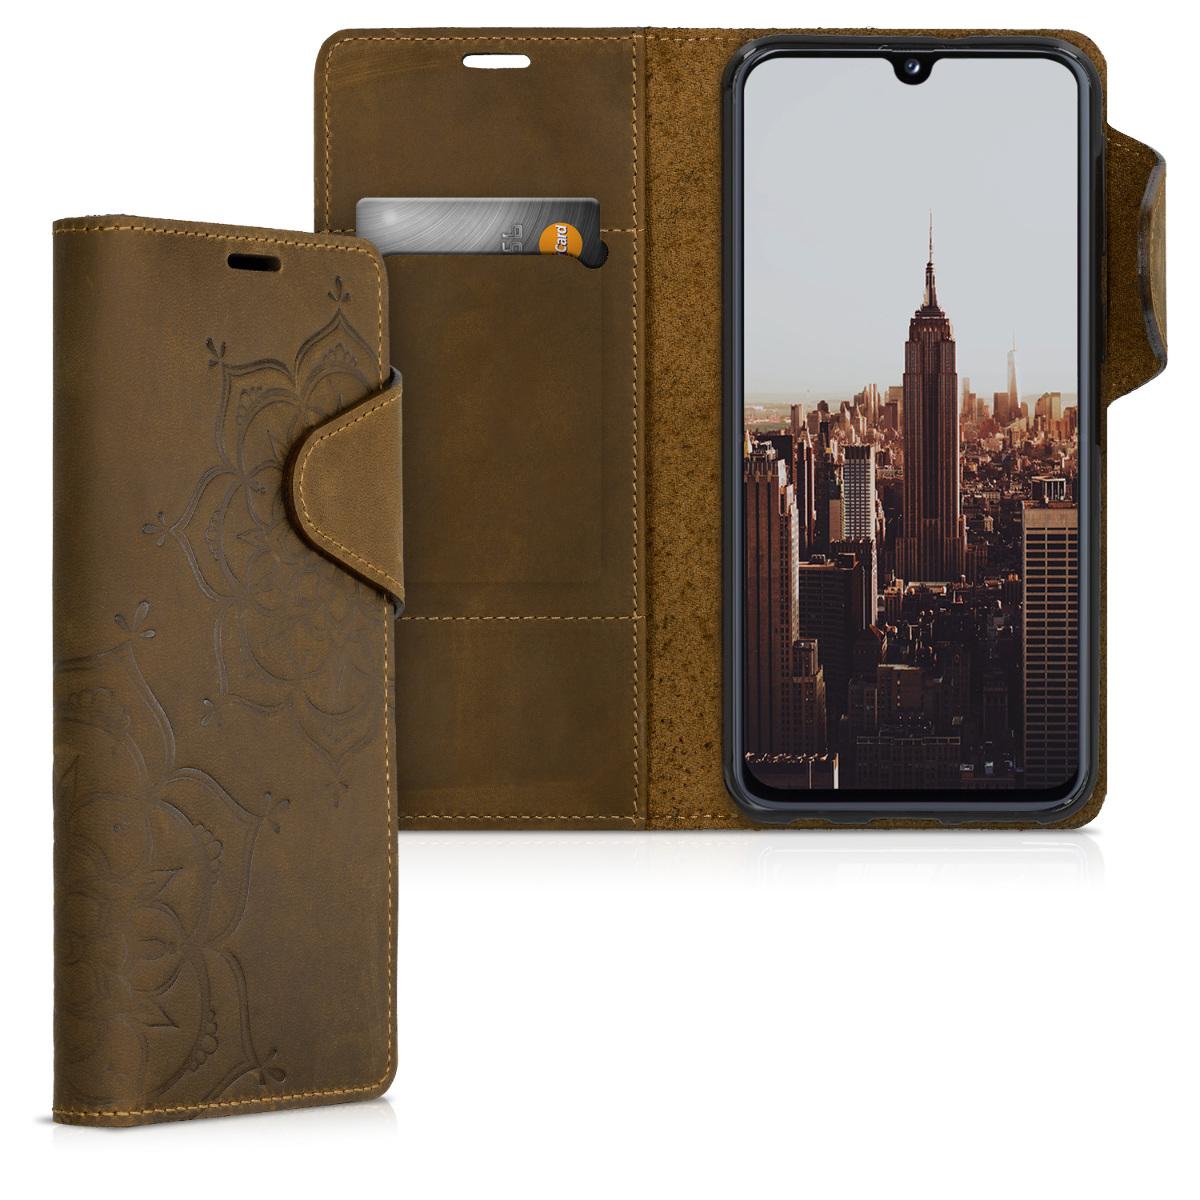 Kalibri Δερμάτινη Suede Θήκη - Πορτοφόλι Samsung Galaxy A40 - Brown (49445.02)